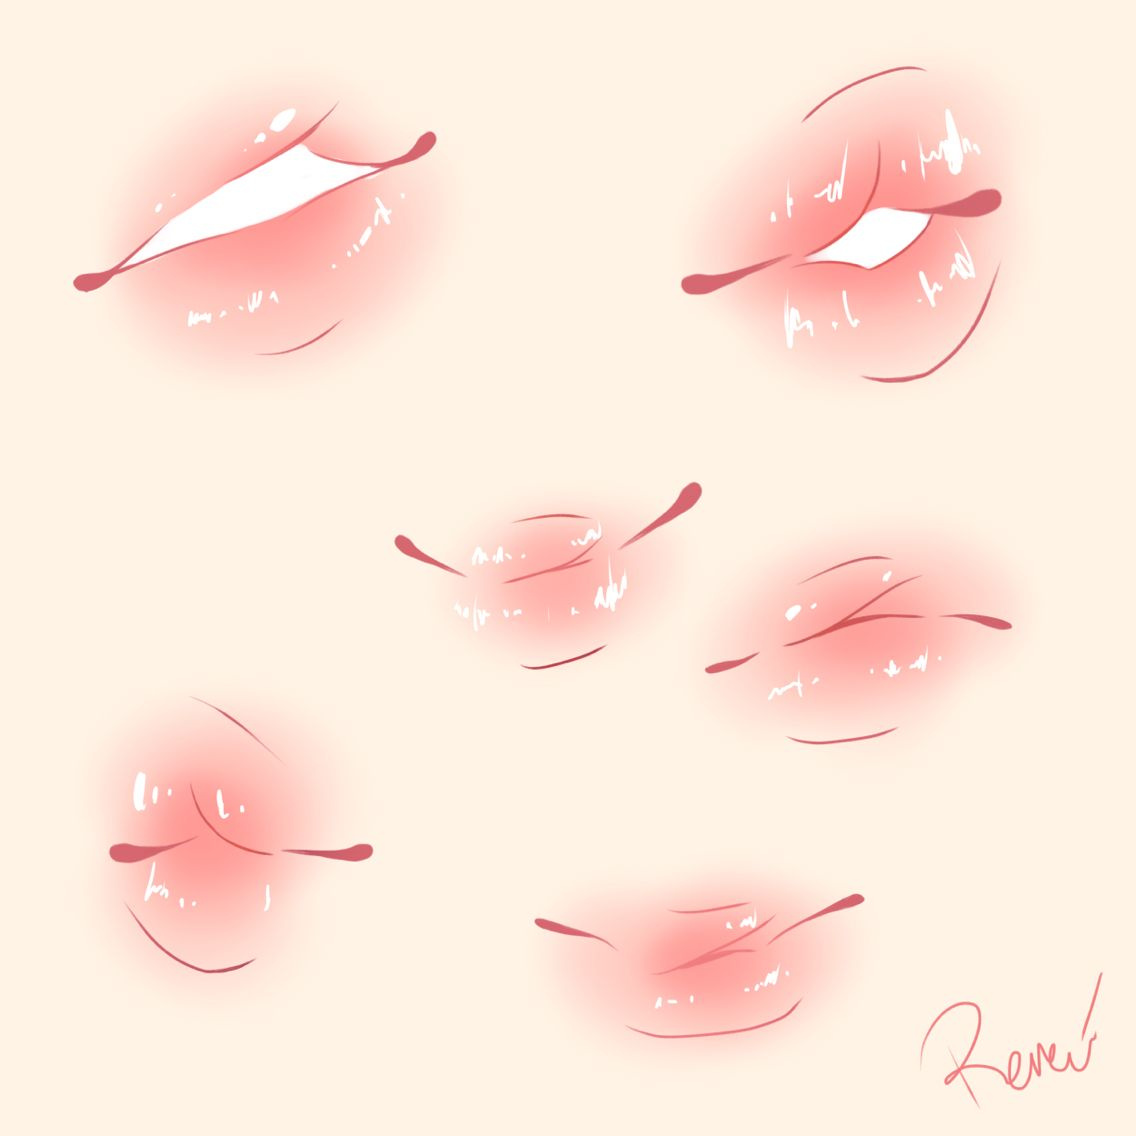 Plump Lips Cute Colouring Drawing Expressions Digital Art